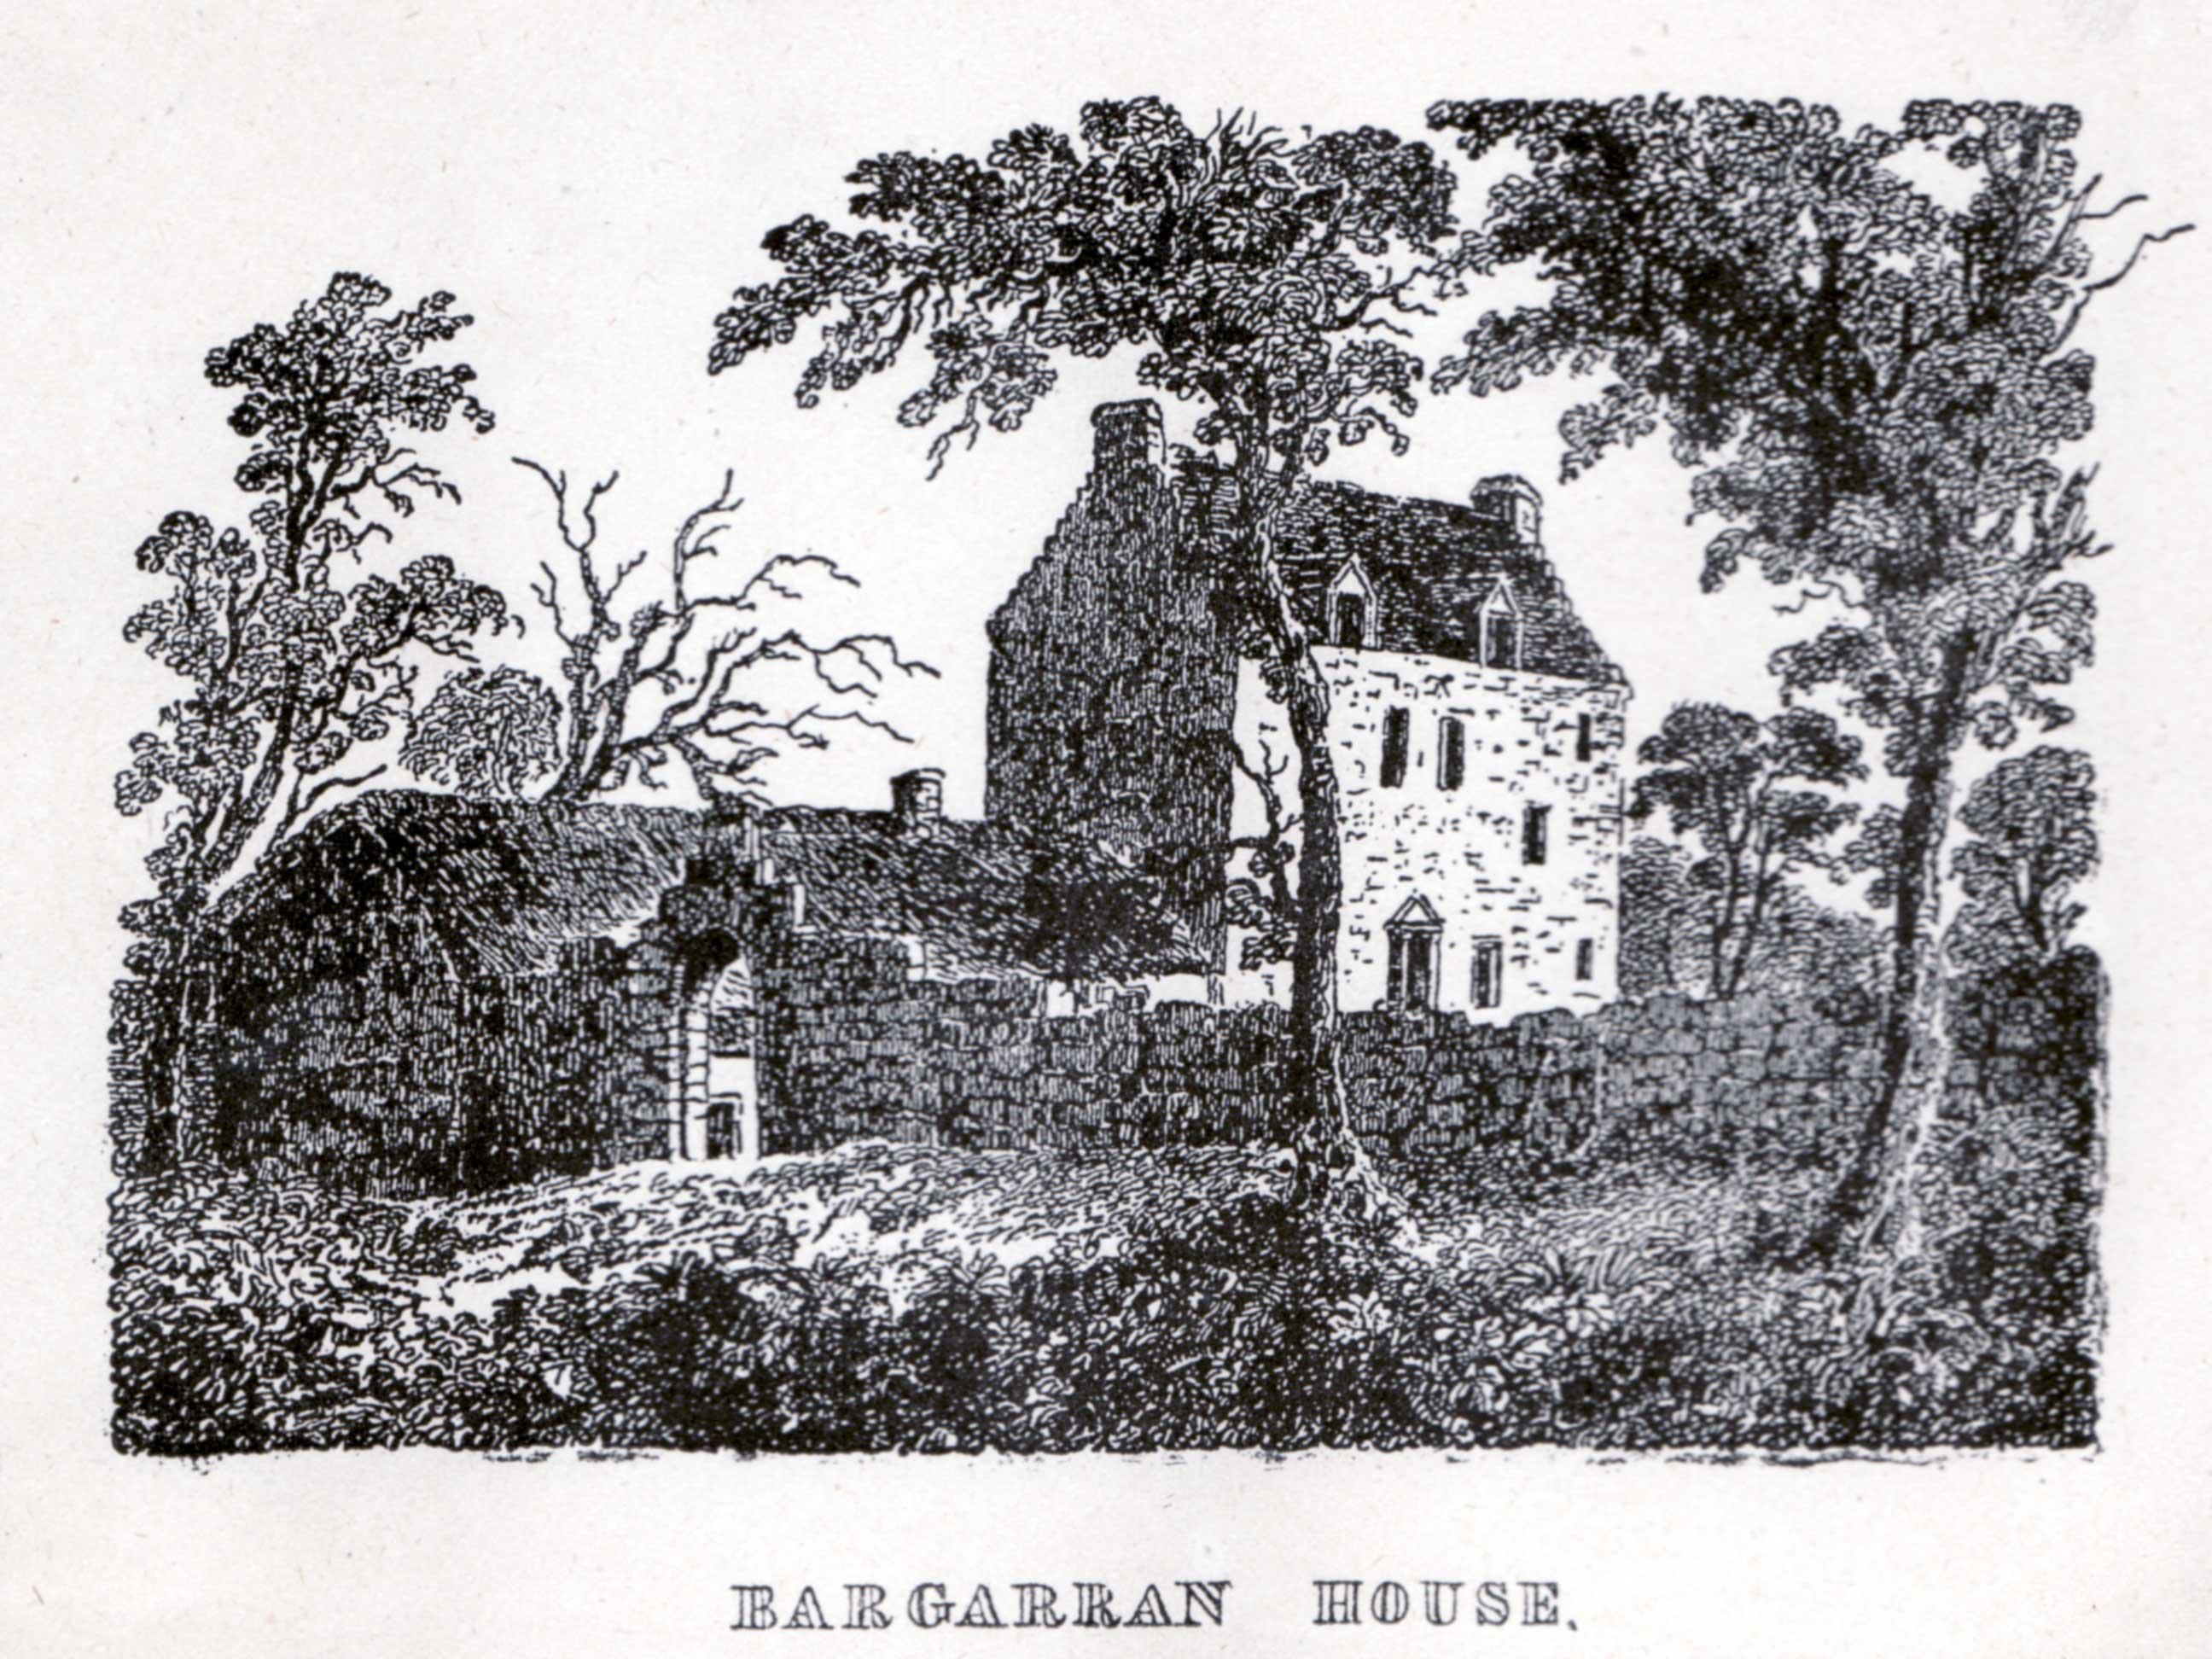 Dark Events at Bargarran in 1676